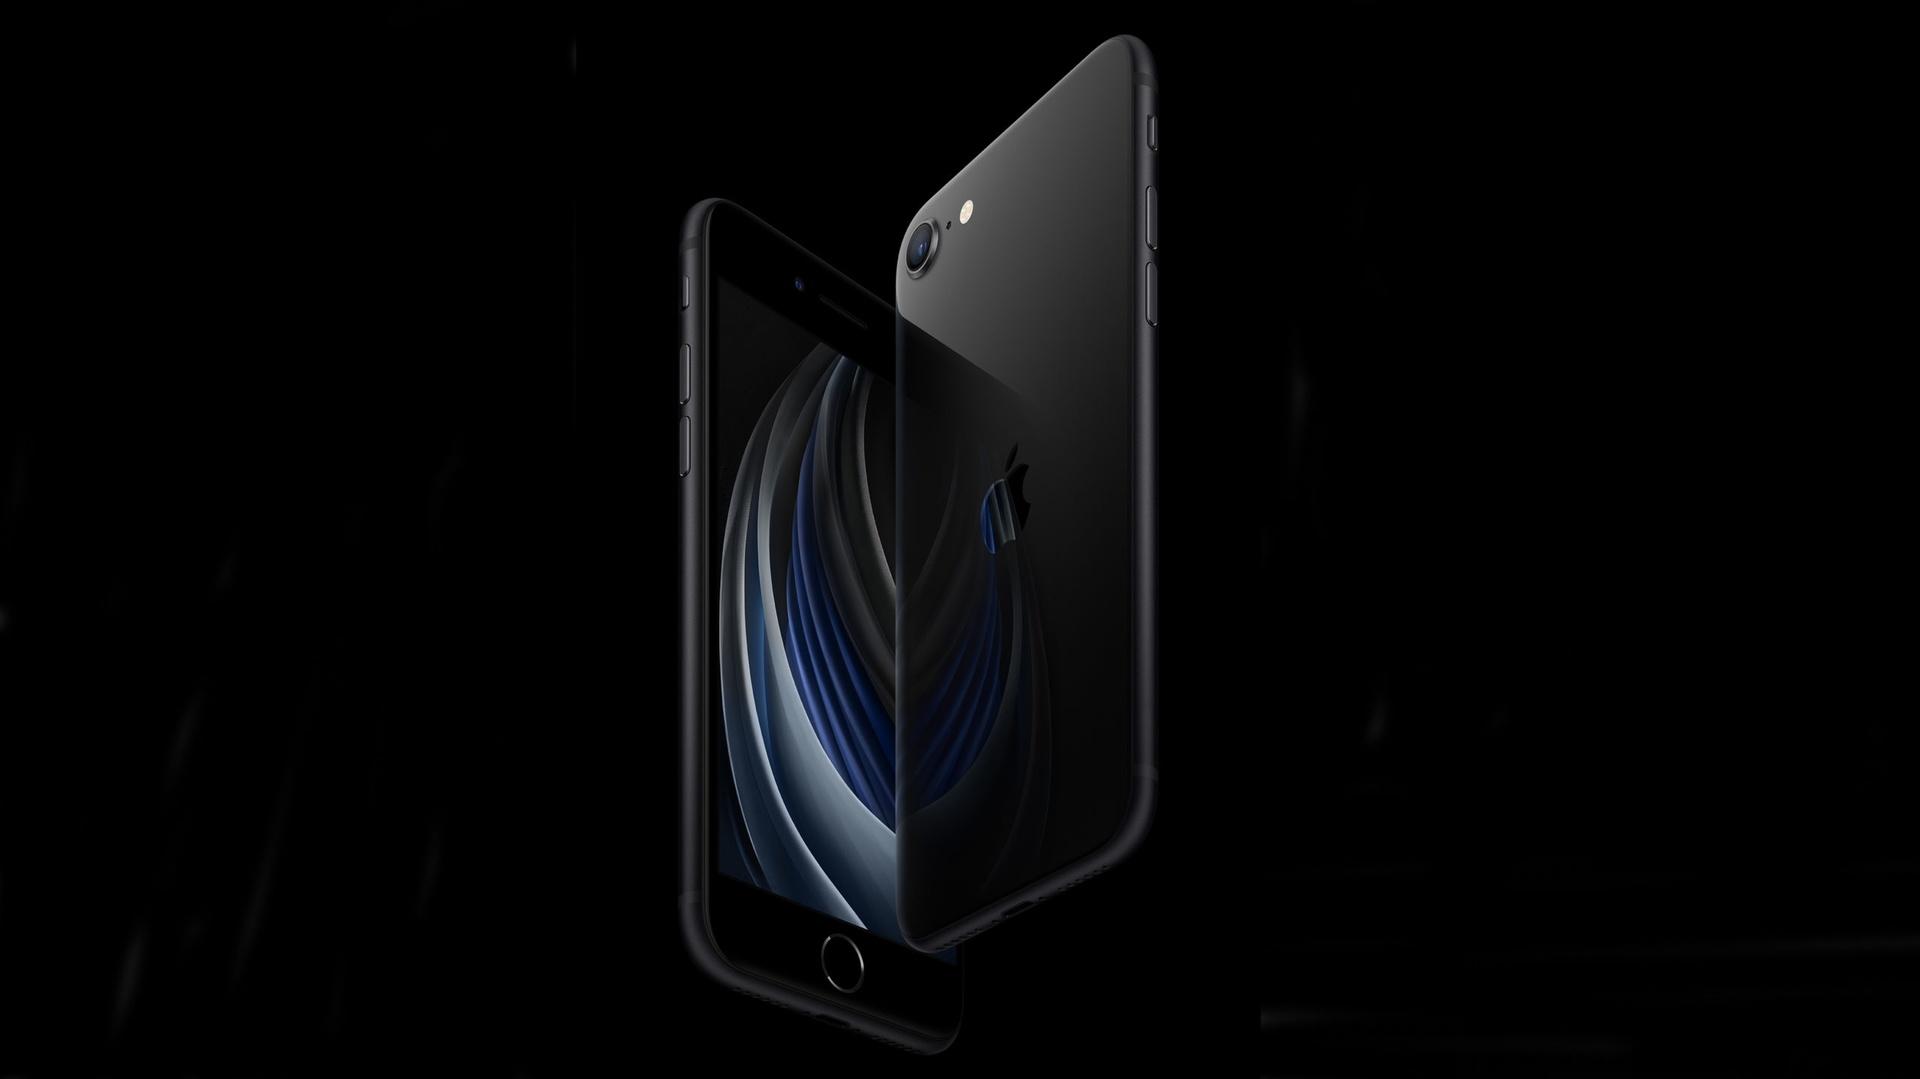 iPhone SE moi dich thi la danh cho gioi game thu anh 3